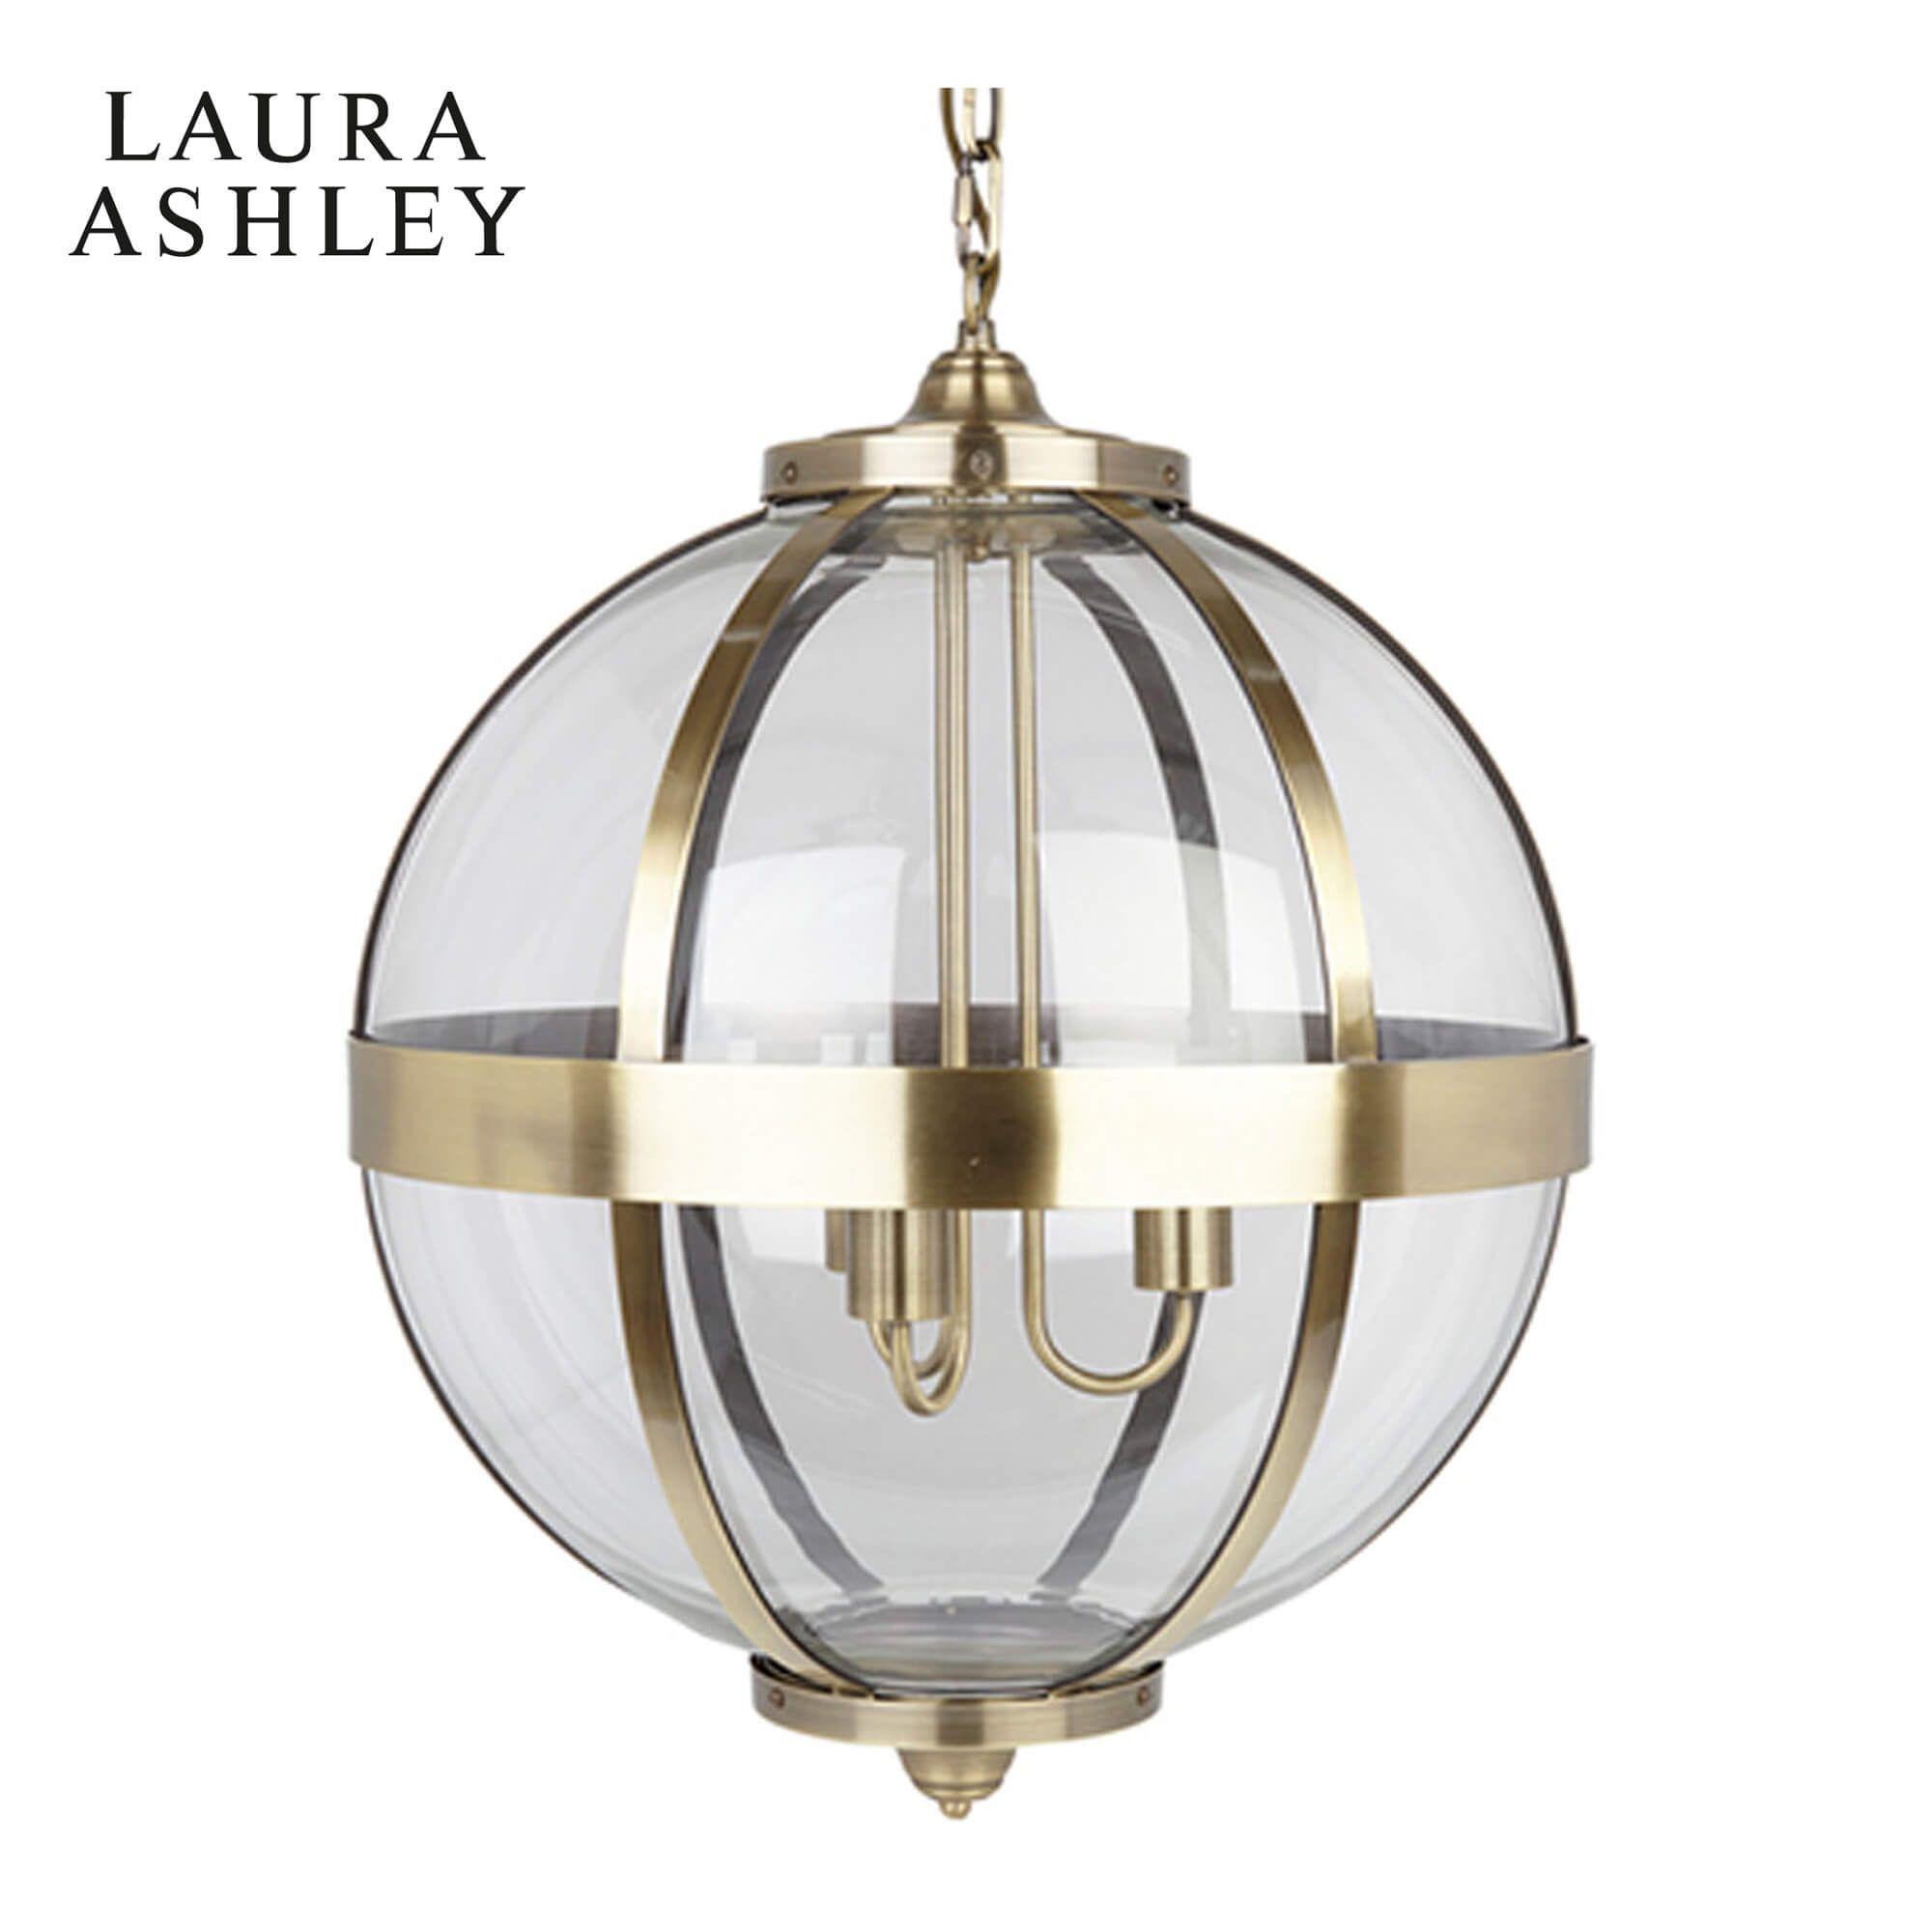 Laura Ashley Odiham Globe Lantern Antique Brass Glass